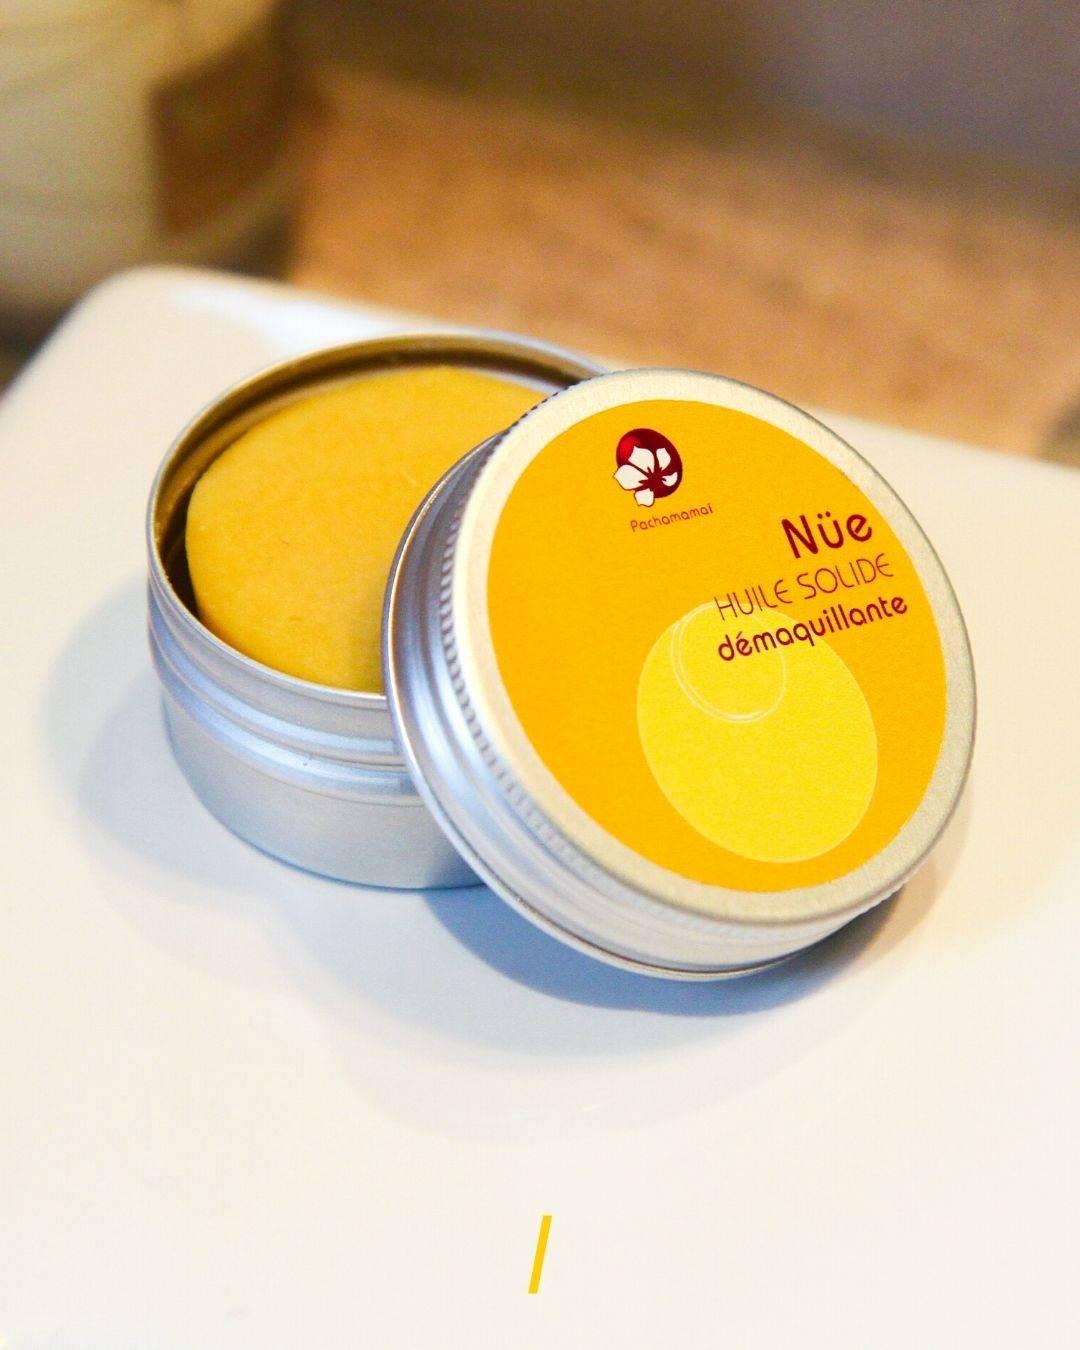 L'huile demaquillante solide - Nue - Pachamamai